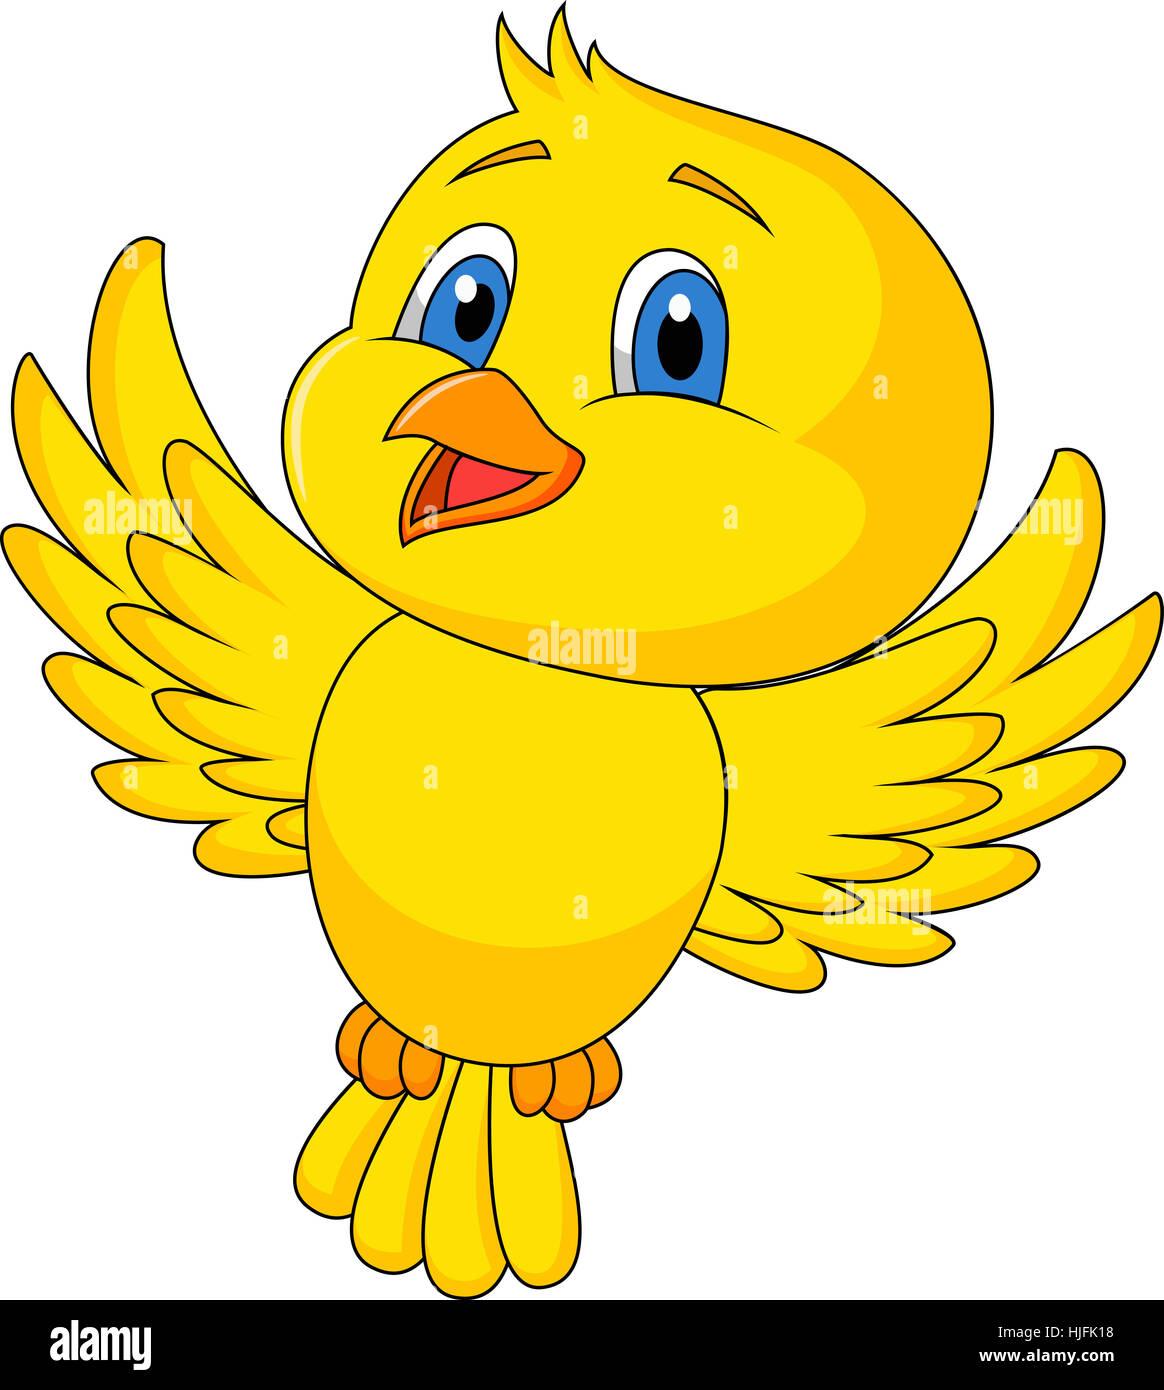 pet, bird, cub, baby, cartoon, maddening, pert, coquettish ...